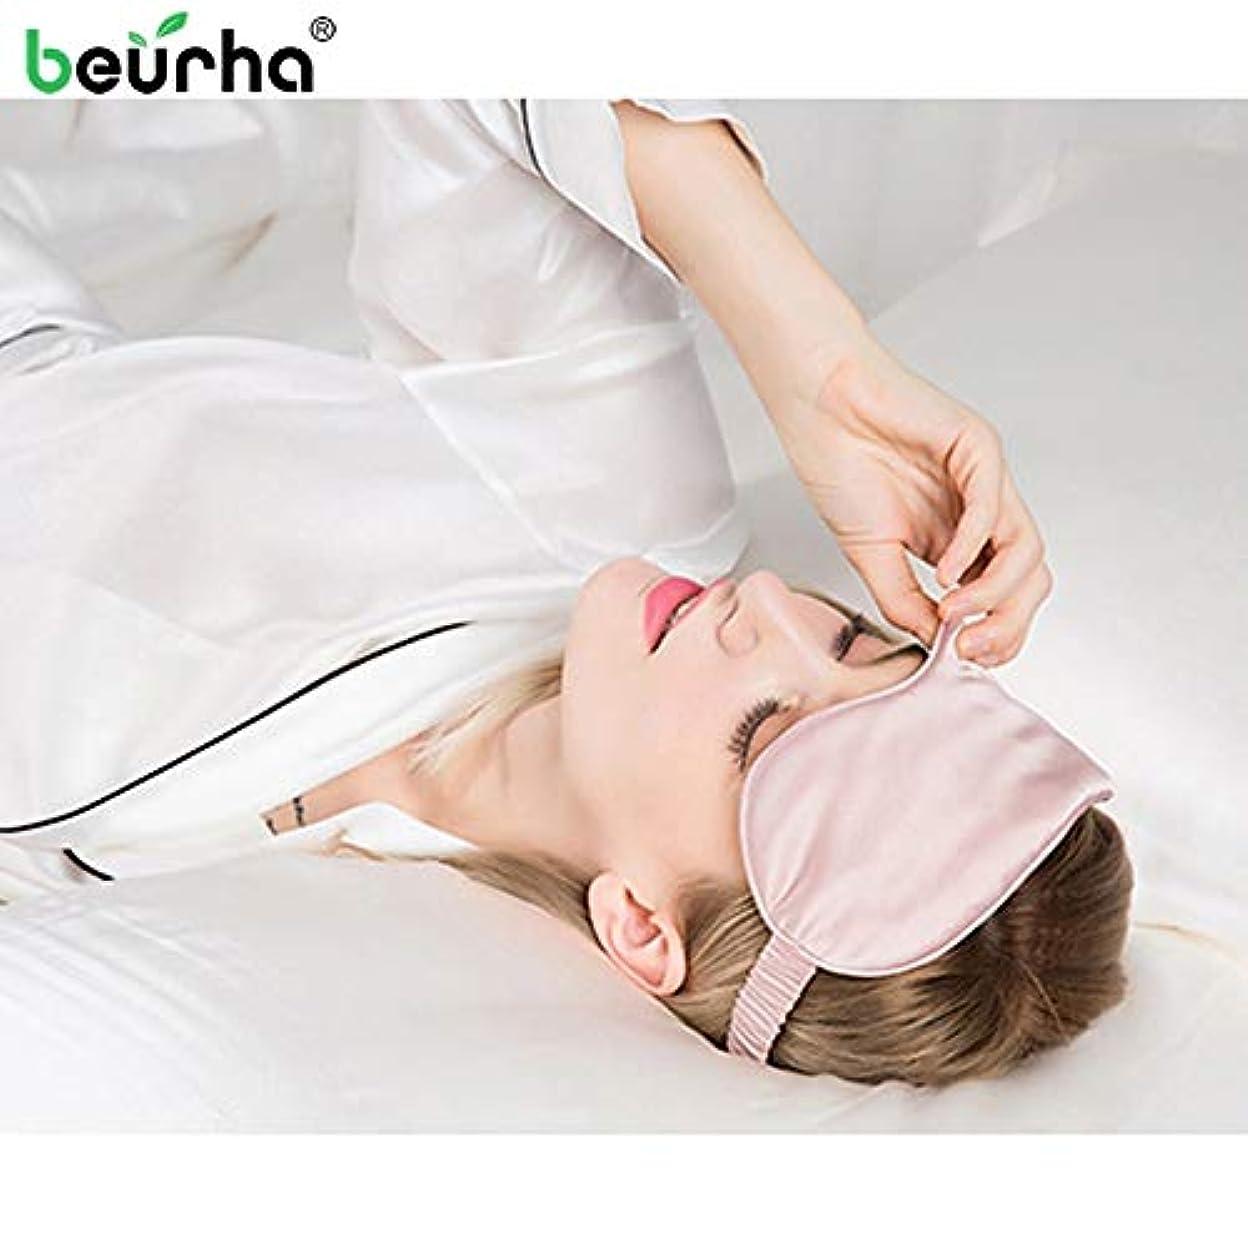 NOTE 滑らかな模造シルクの睡眠マスクしなやかなアイシェードポータブル旅行アイパッチ通気性の残り目隠しアイカバーナイトスリーピングマスク